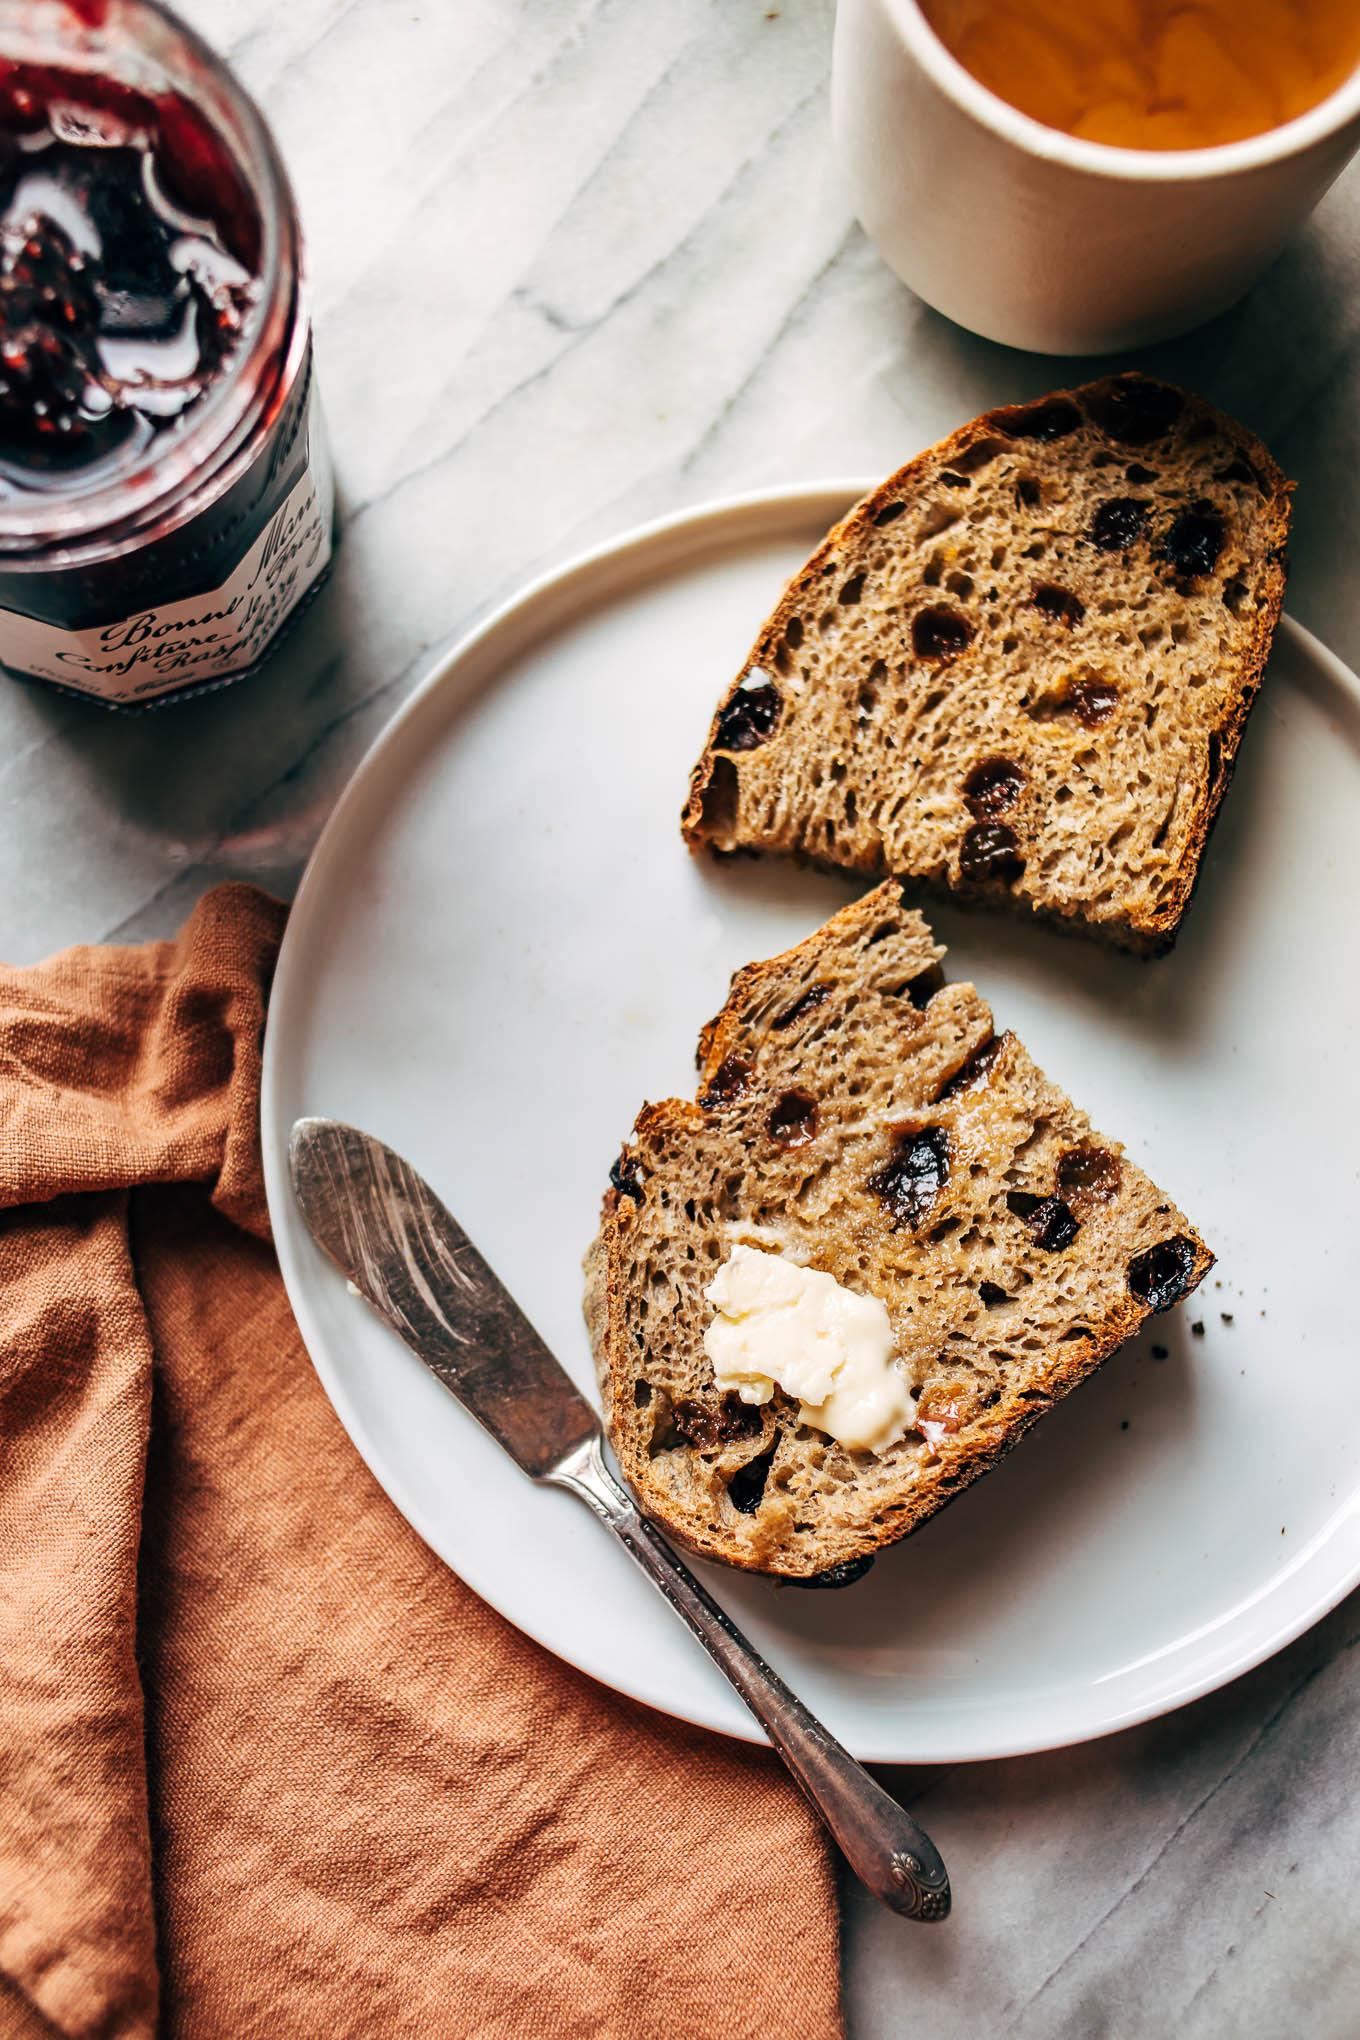 overhead image of two slices of cinnamon raisin sourdough bread on a white plate.